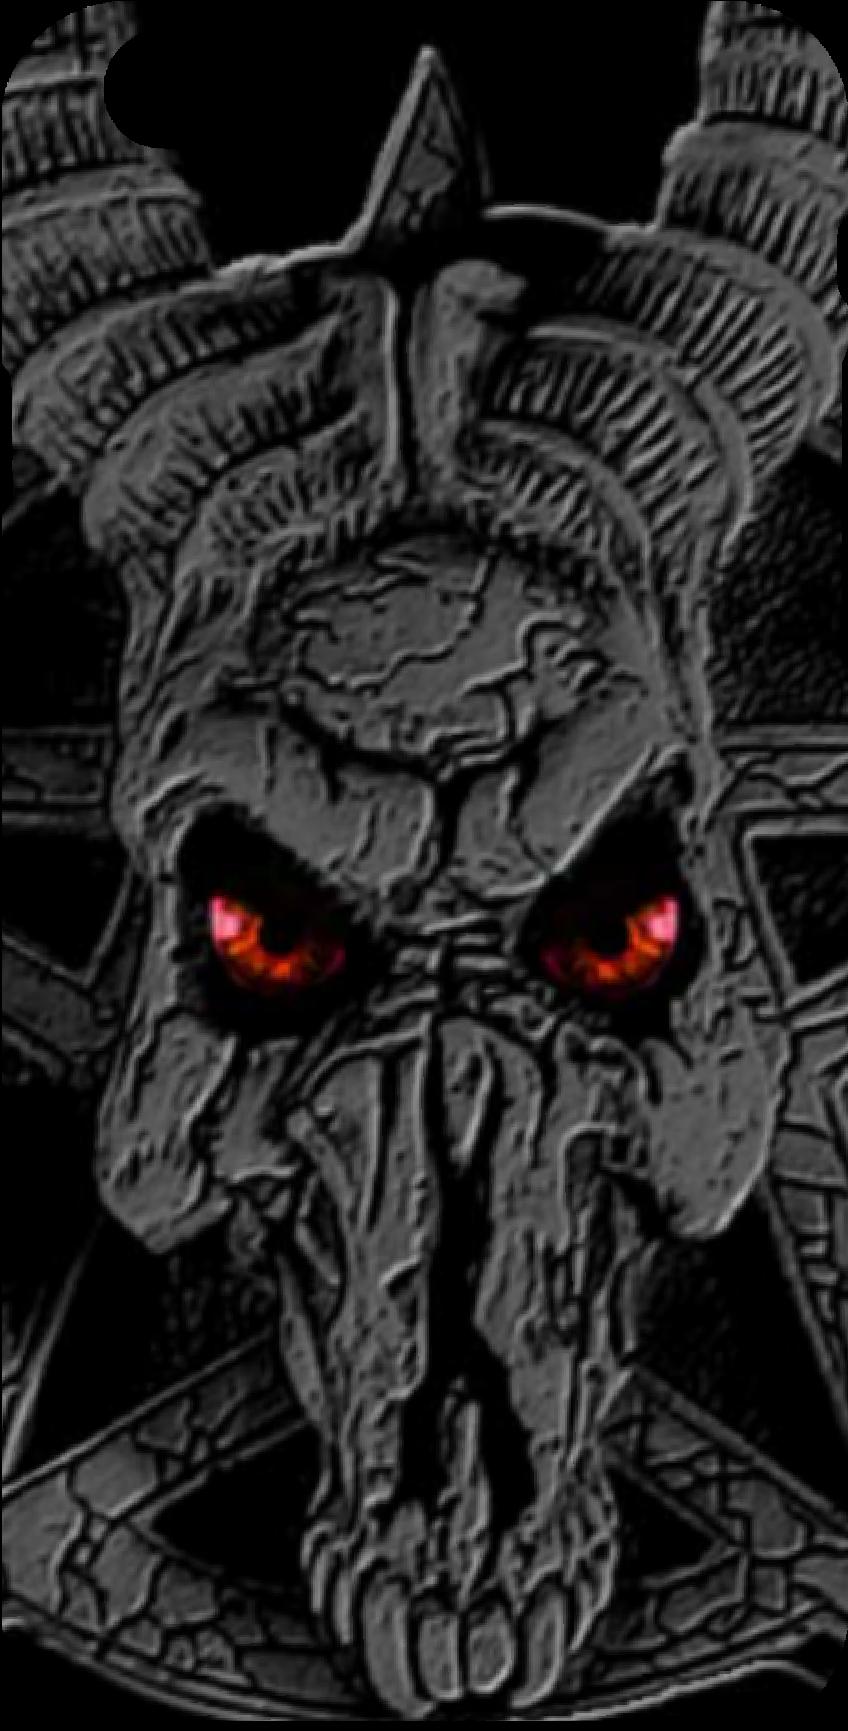 cover Satanic cover